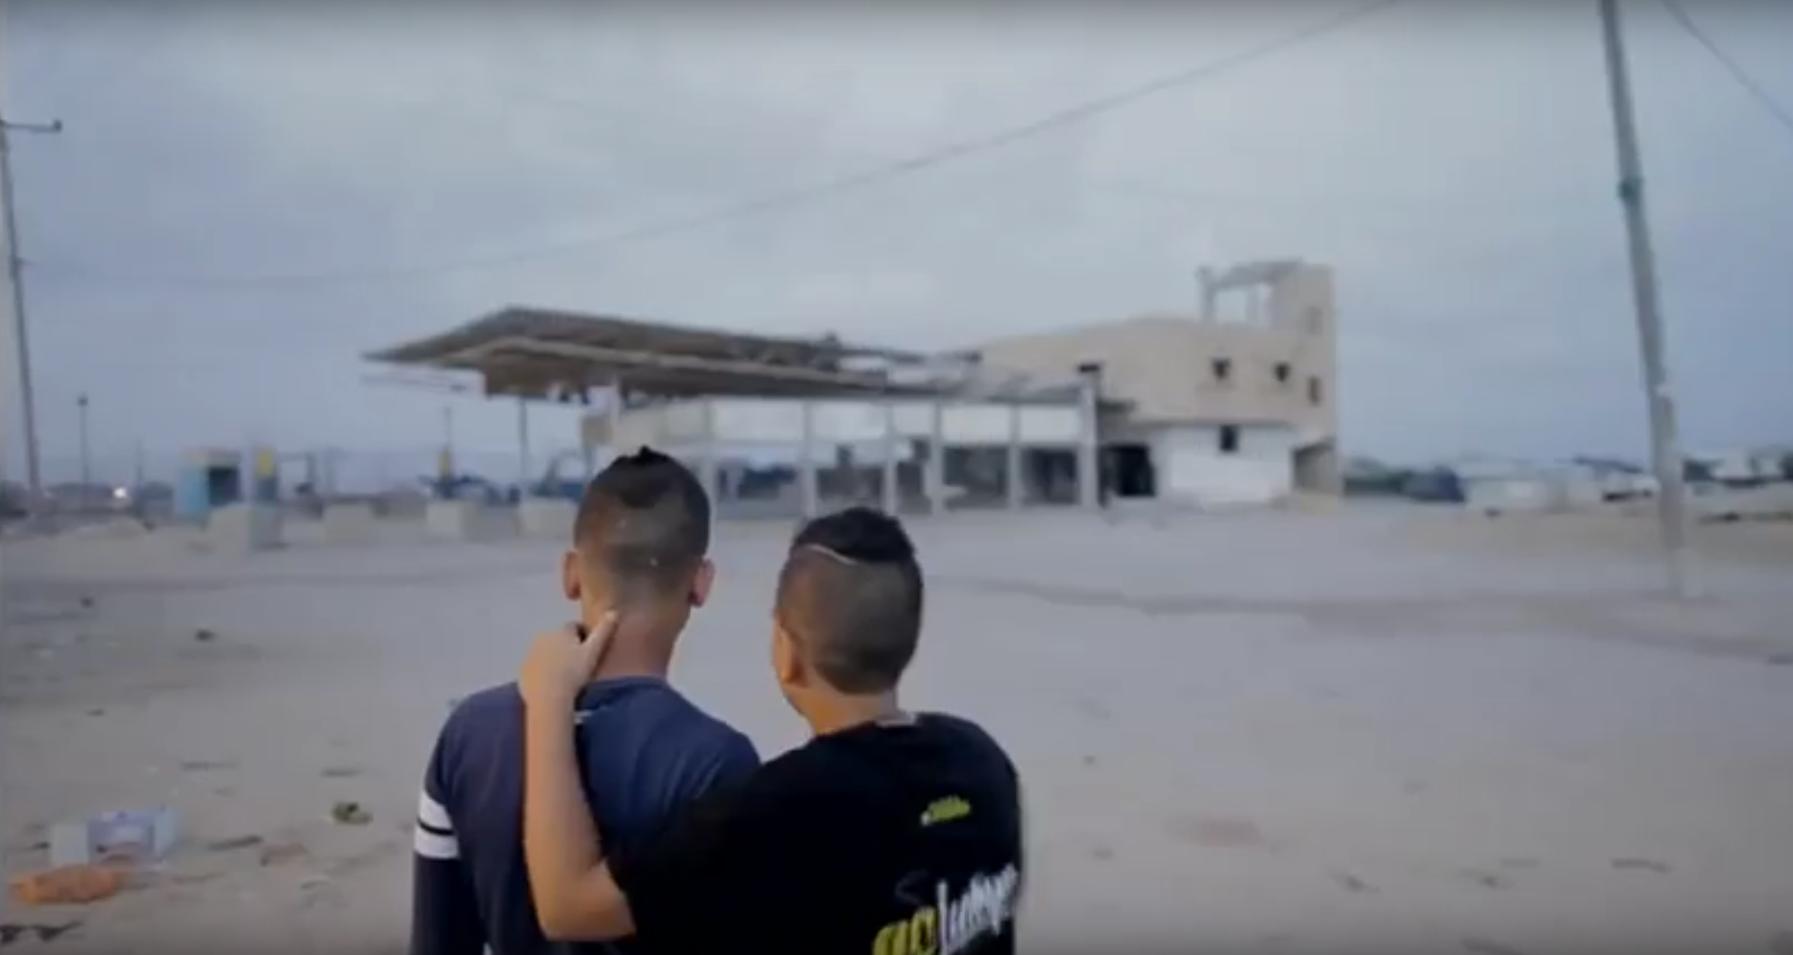 BBC - CHILDREN OF GAZA